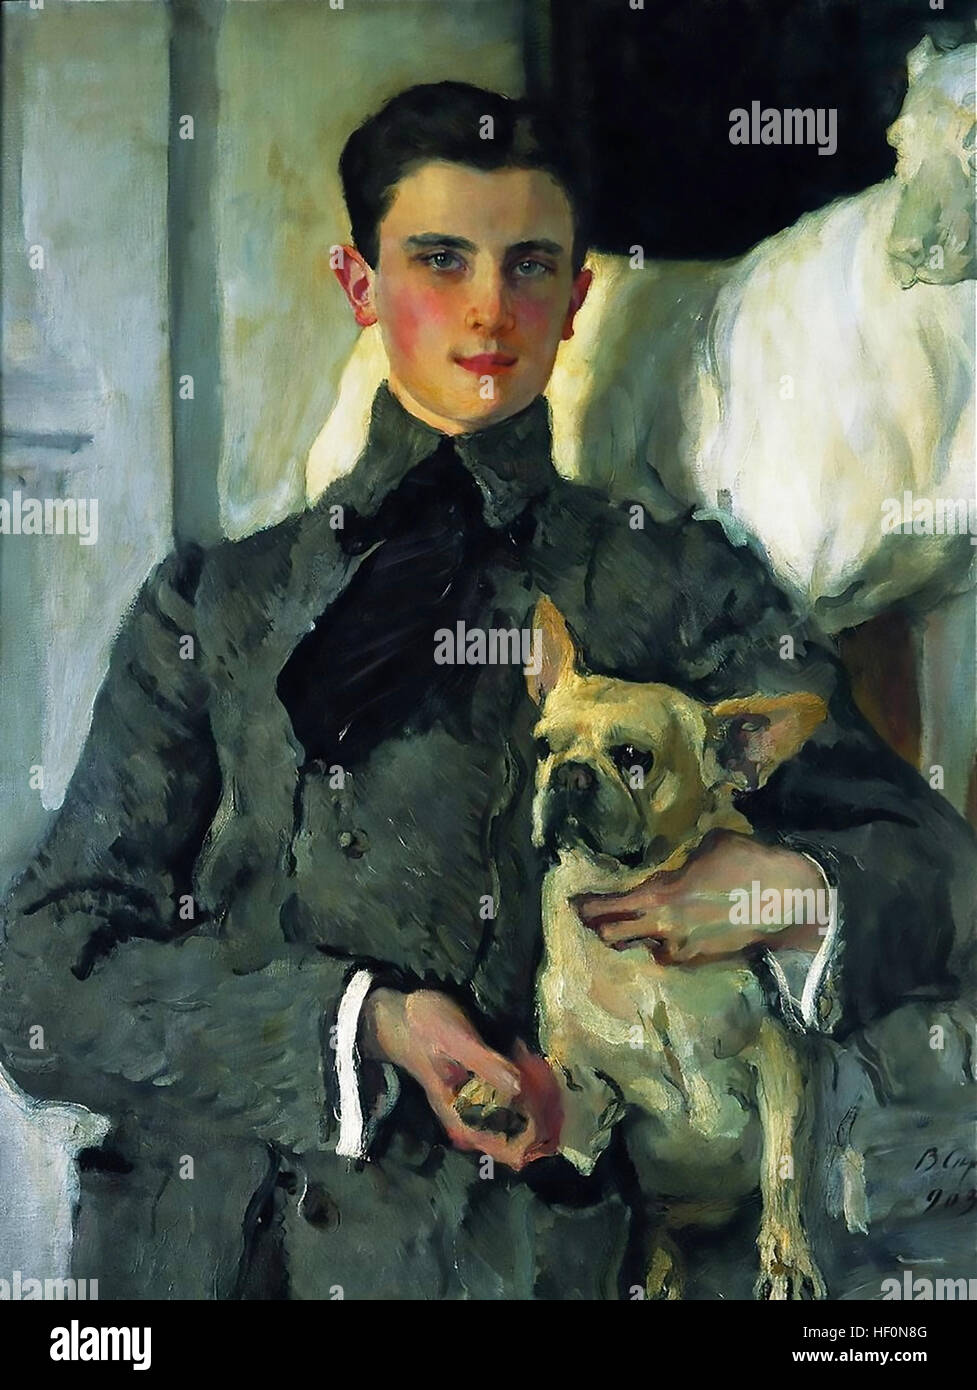 FELIX YUSUPOV (1887-1967) Russian aristocrat involved in the assassination of Rasputin painted by Valentin Serov - Stock Image